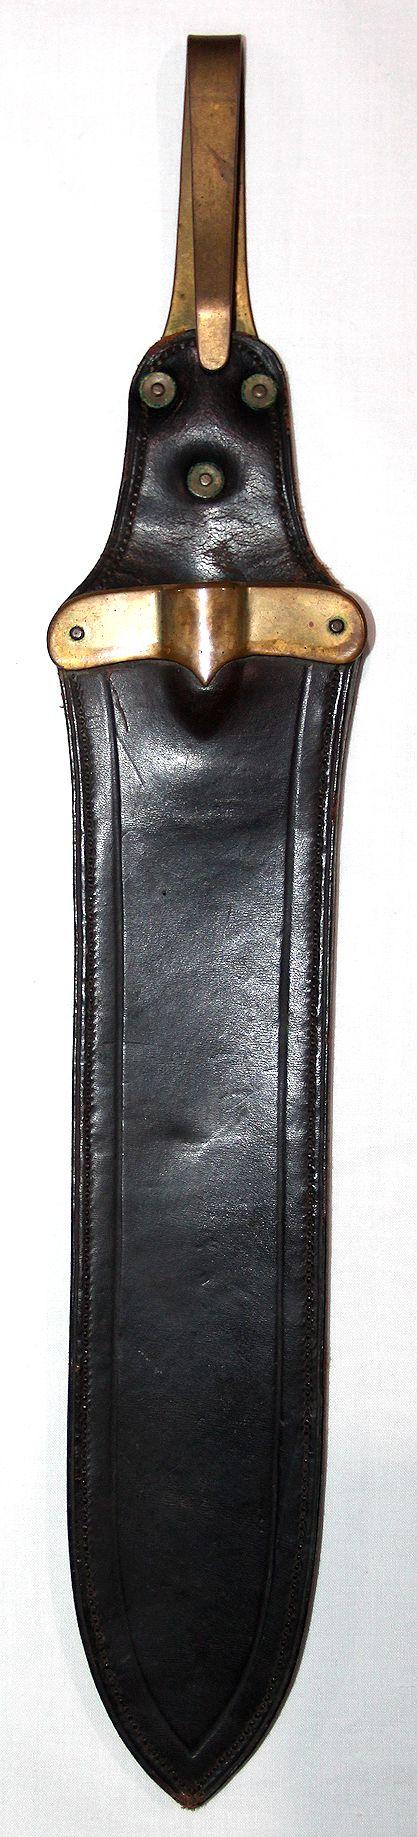 A051. NICE 1887 HOSPITAL CORPS KNIFE LEATHER SCABBARD